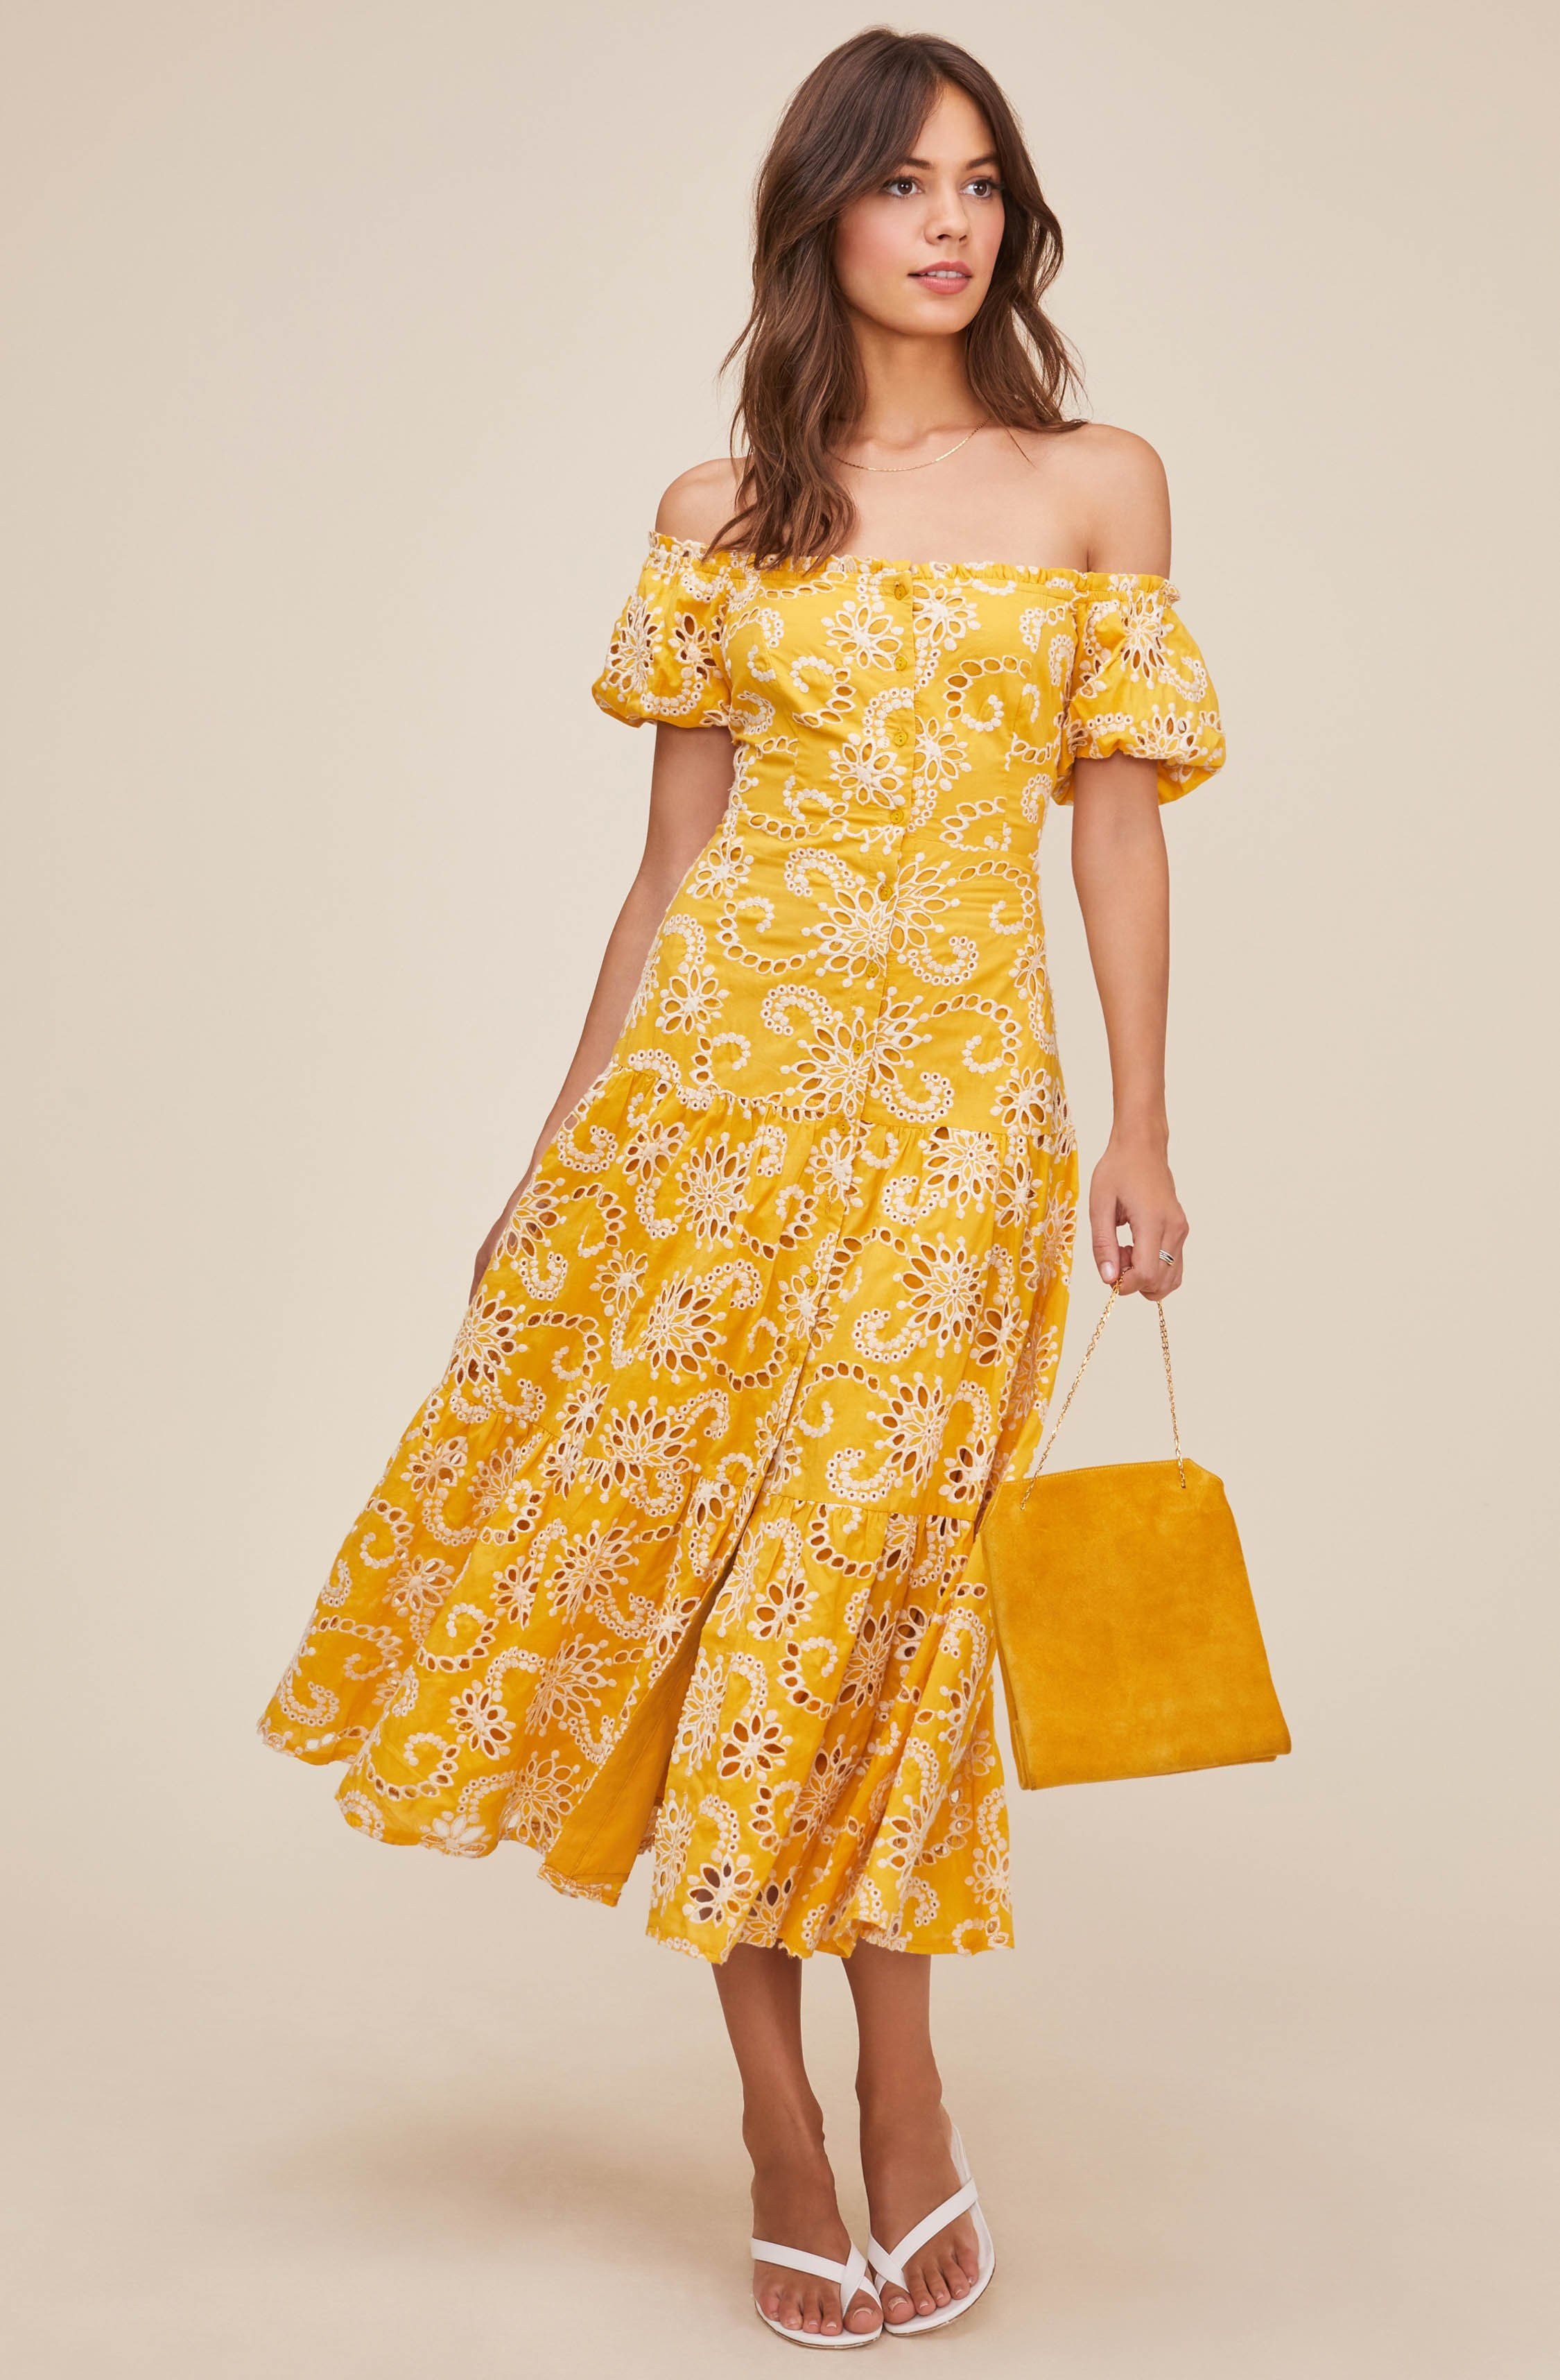 Off Shoulder Dresses And Eyelet Dress Styles Are Summer Staples Shop Midi Dresses At Astr Midi Dress Dresses Select Dress [ 3432 x 2250 Pixel ]